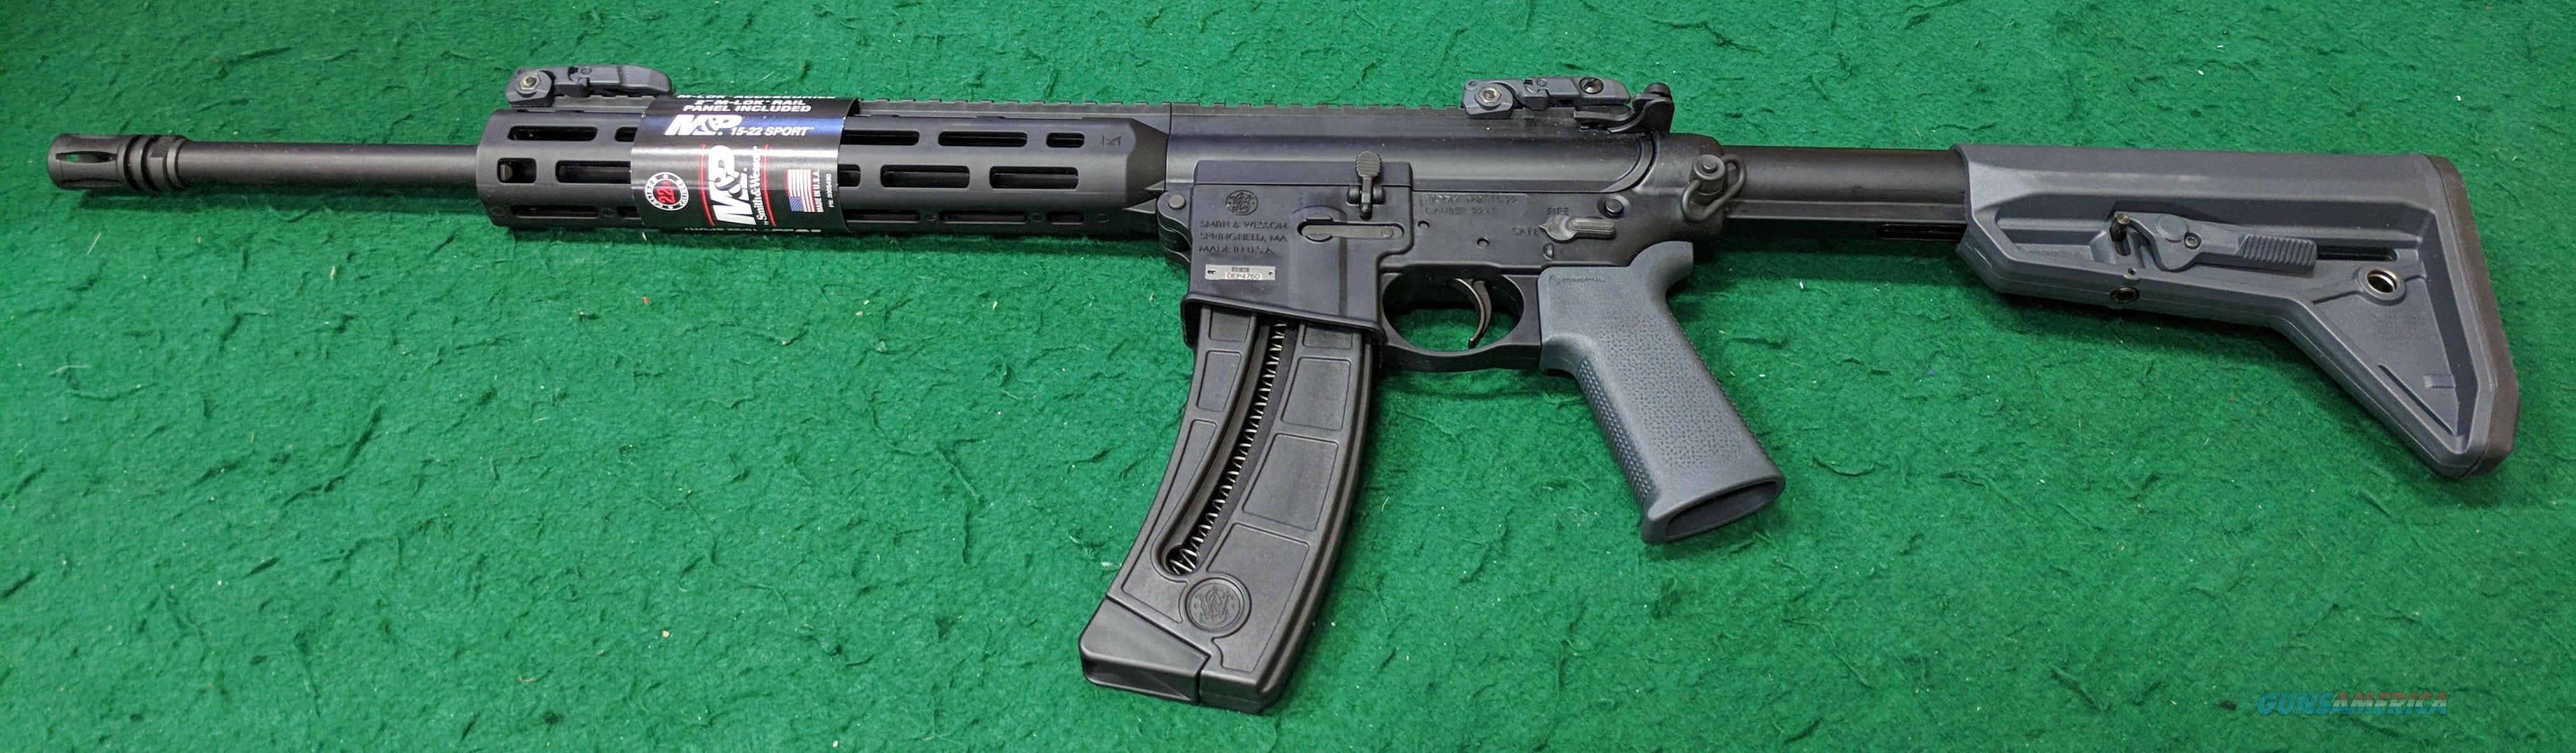 Smith & Wesson - M&P 15-22 - 22LR  Guns > Rifles > Smith & Wesson Rifles > M&P